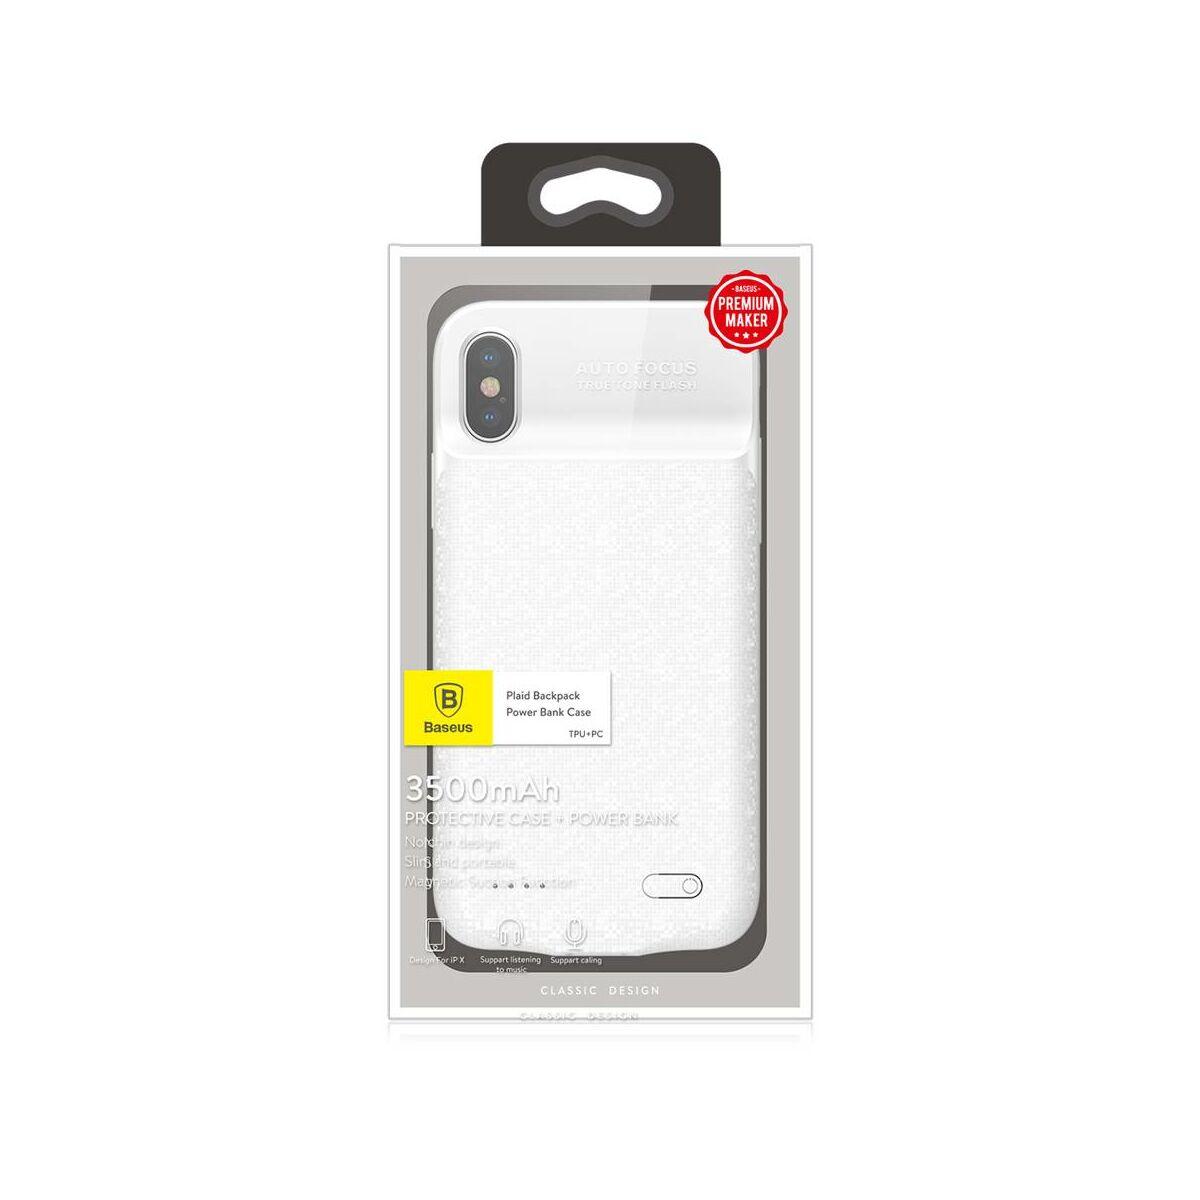 Baseus Power Bank tok, Plaid Backpack 3500 mAh iPhone X, fehér (ACAPIPHX-BJ02)